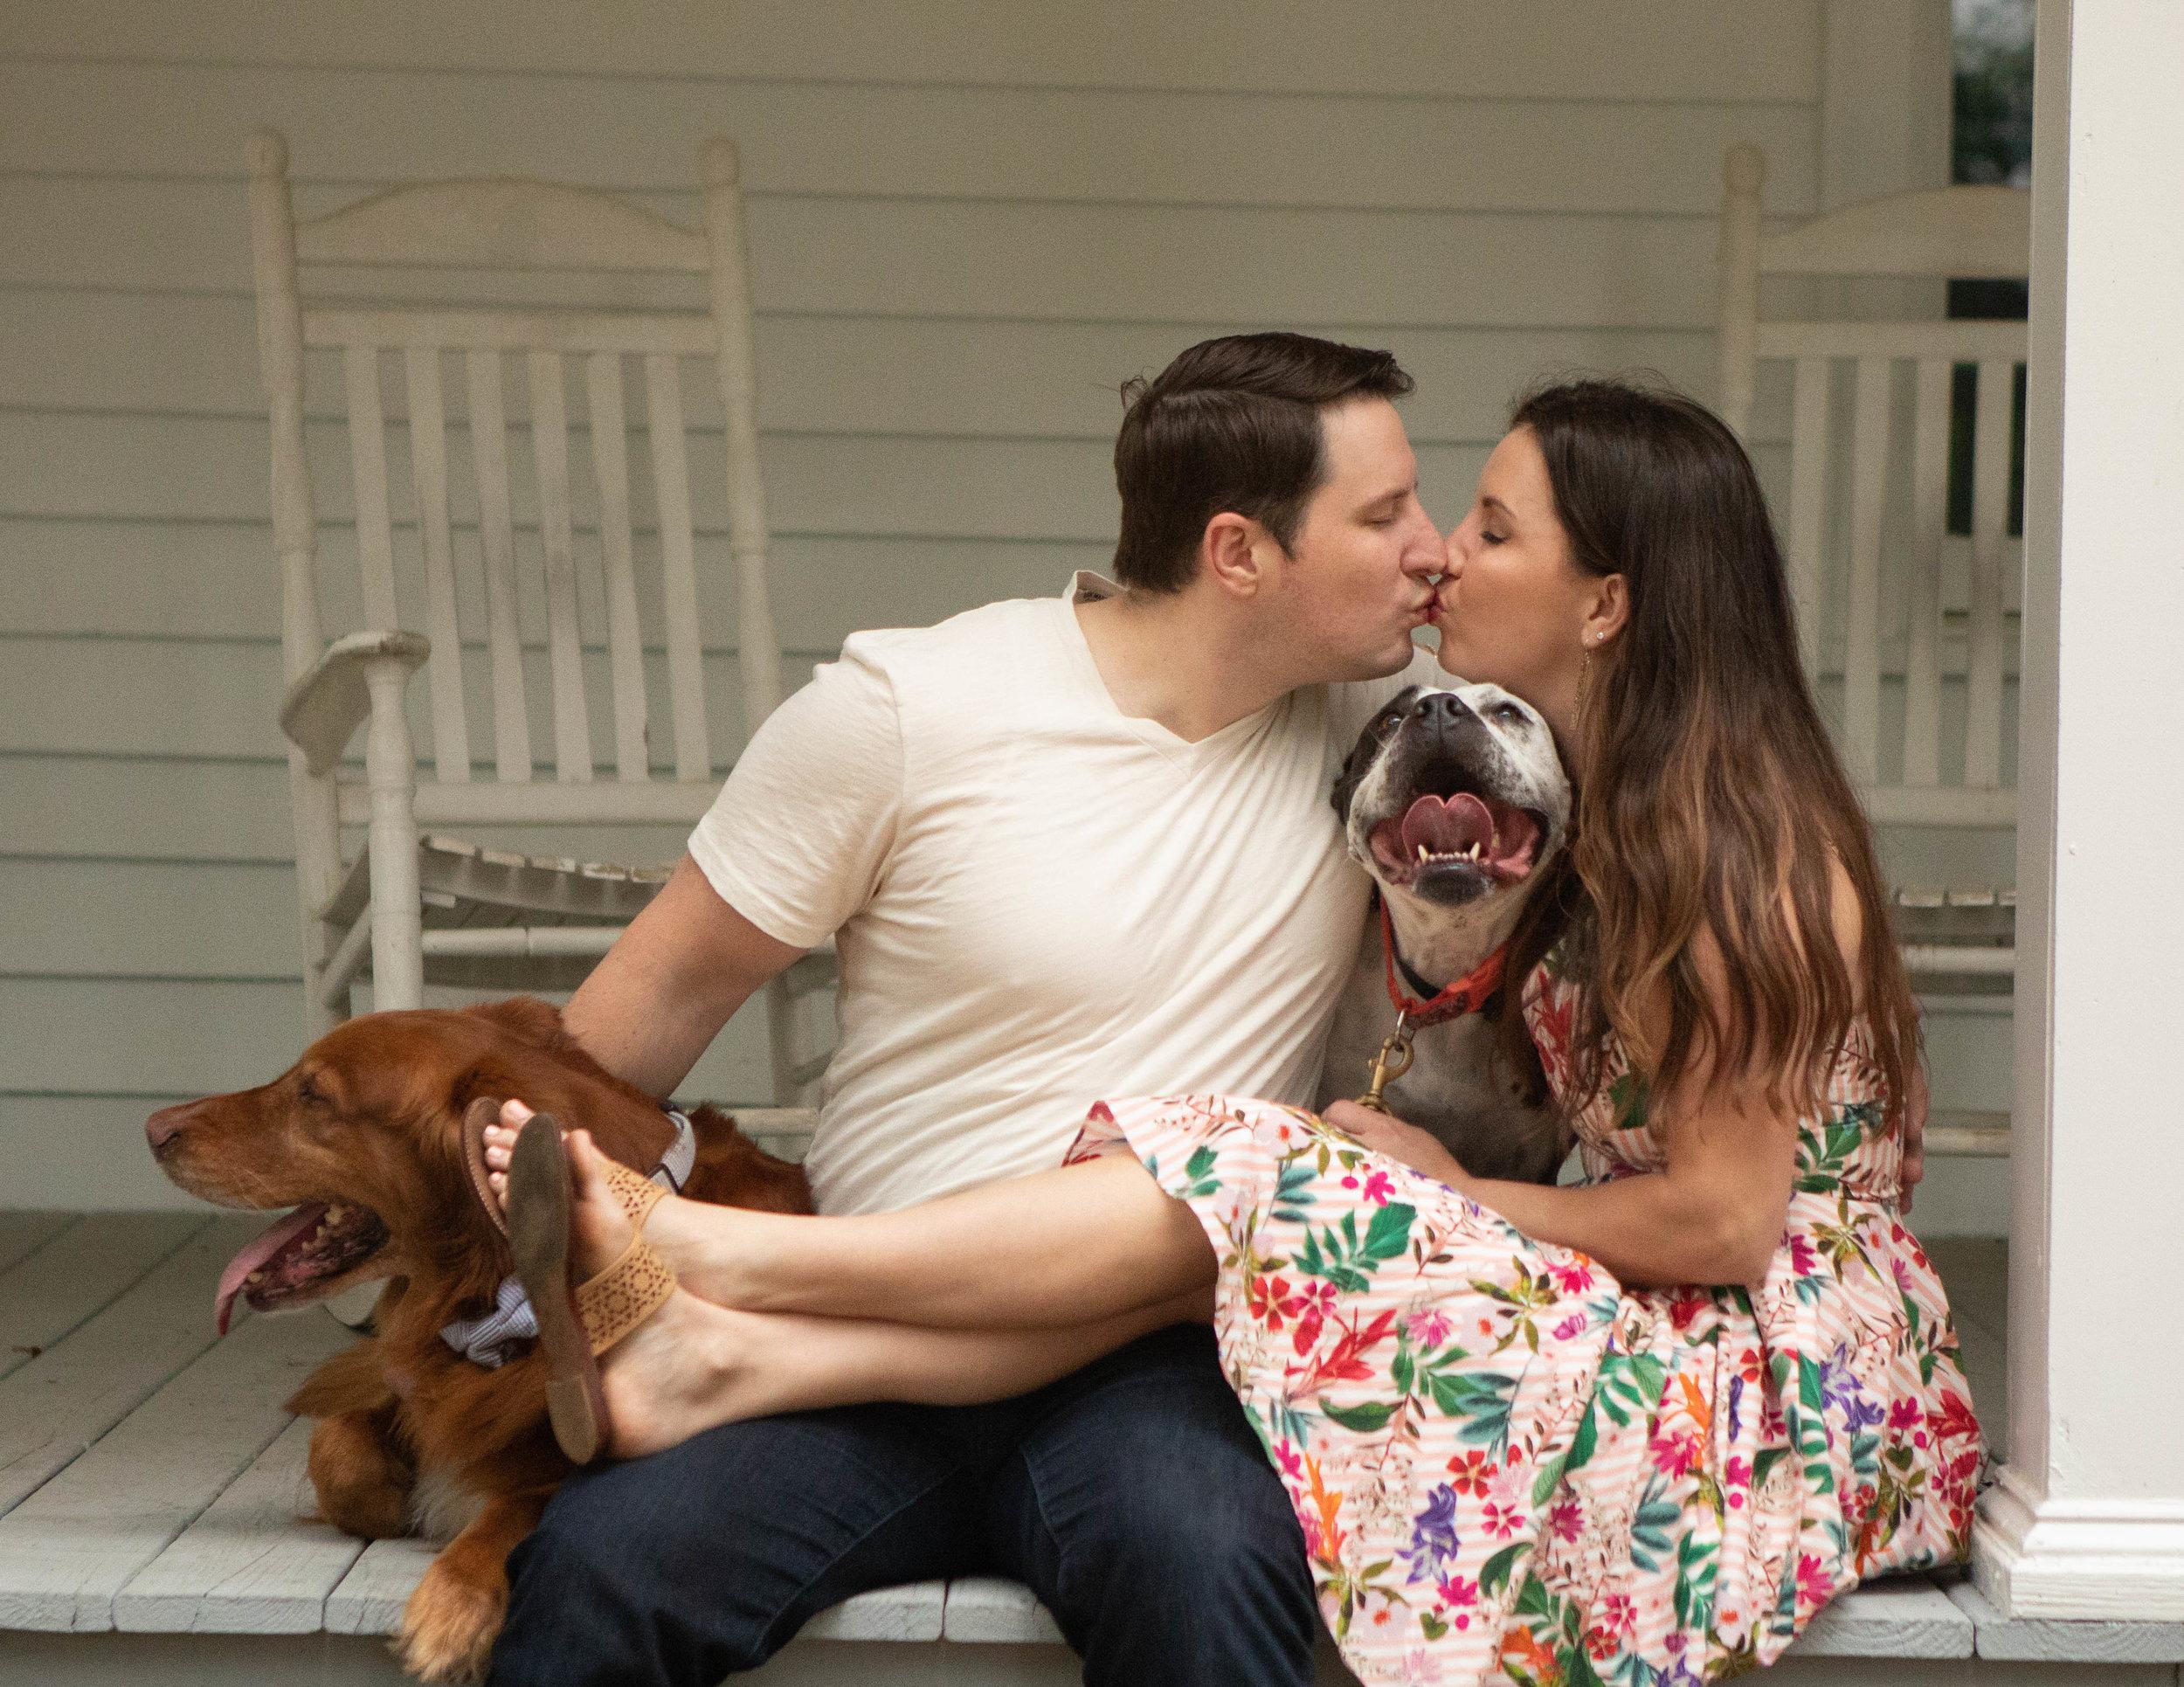 atlanta wedding photographers - atlantaartisticweddings - engagement session with pets.jpg